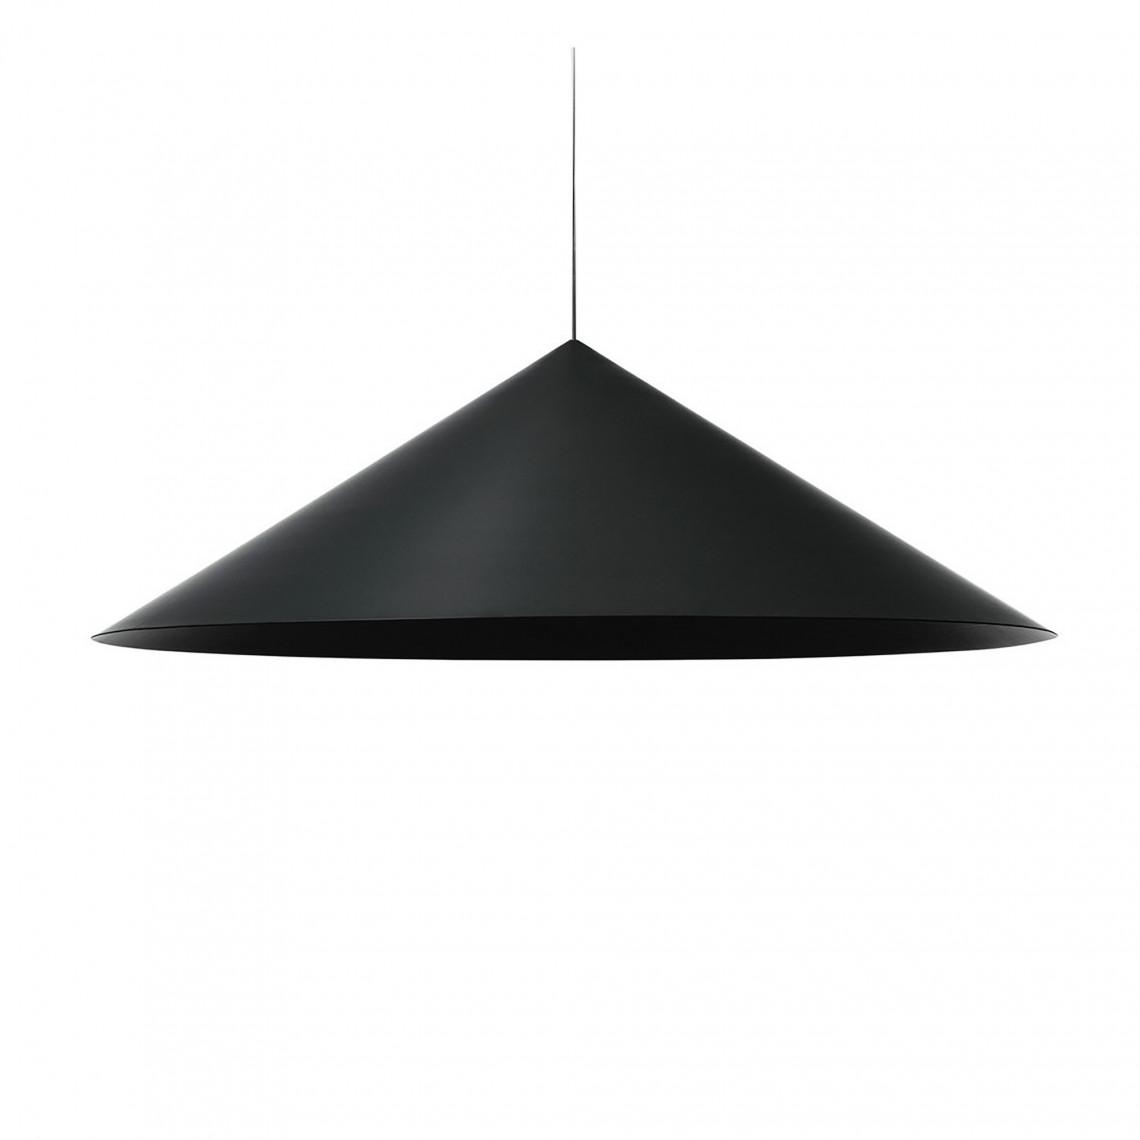 Extra Large Pendant w151s3 Jet Black